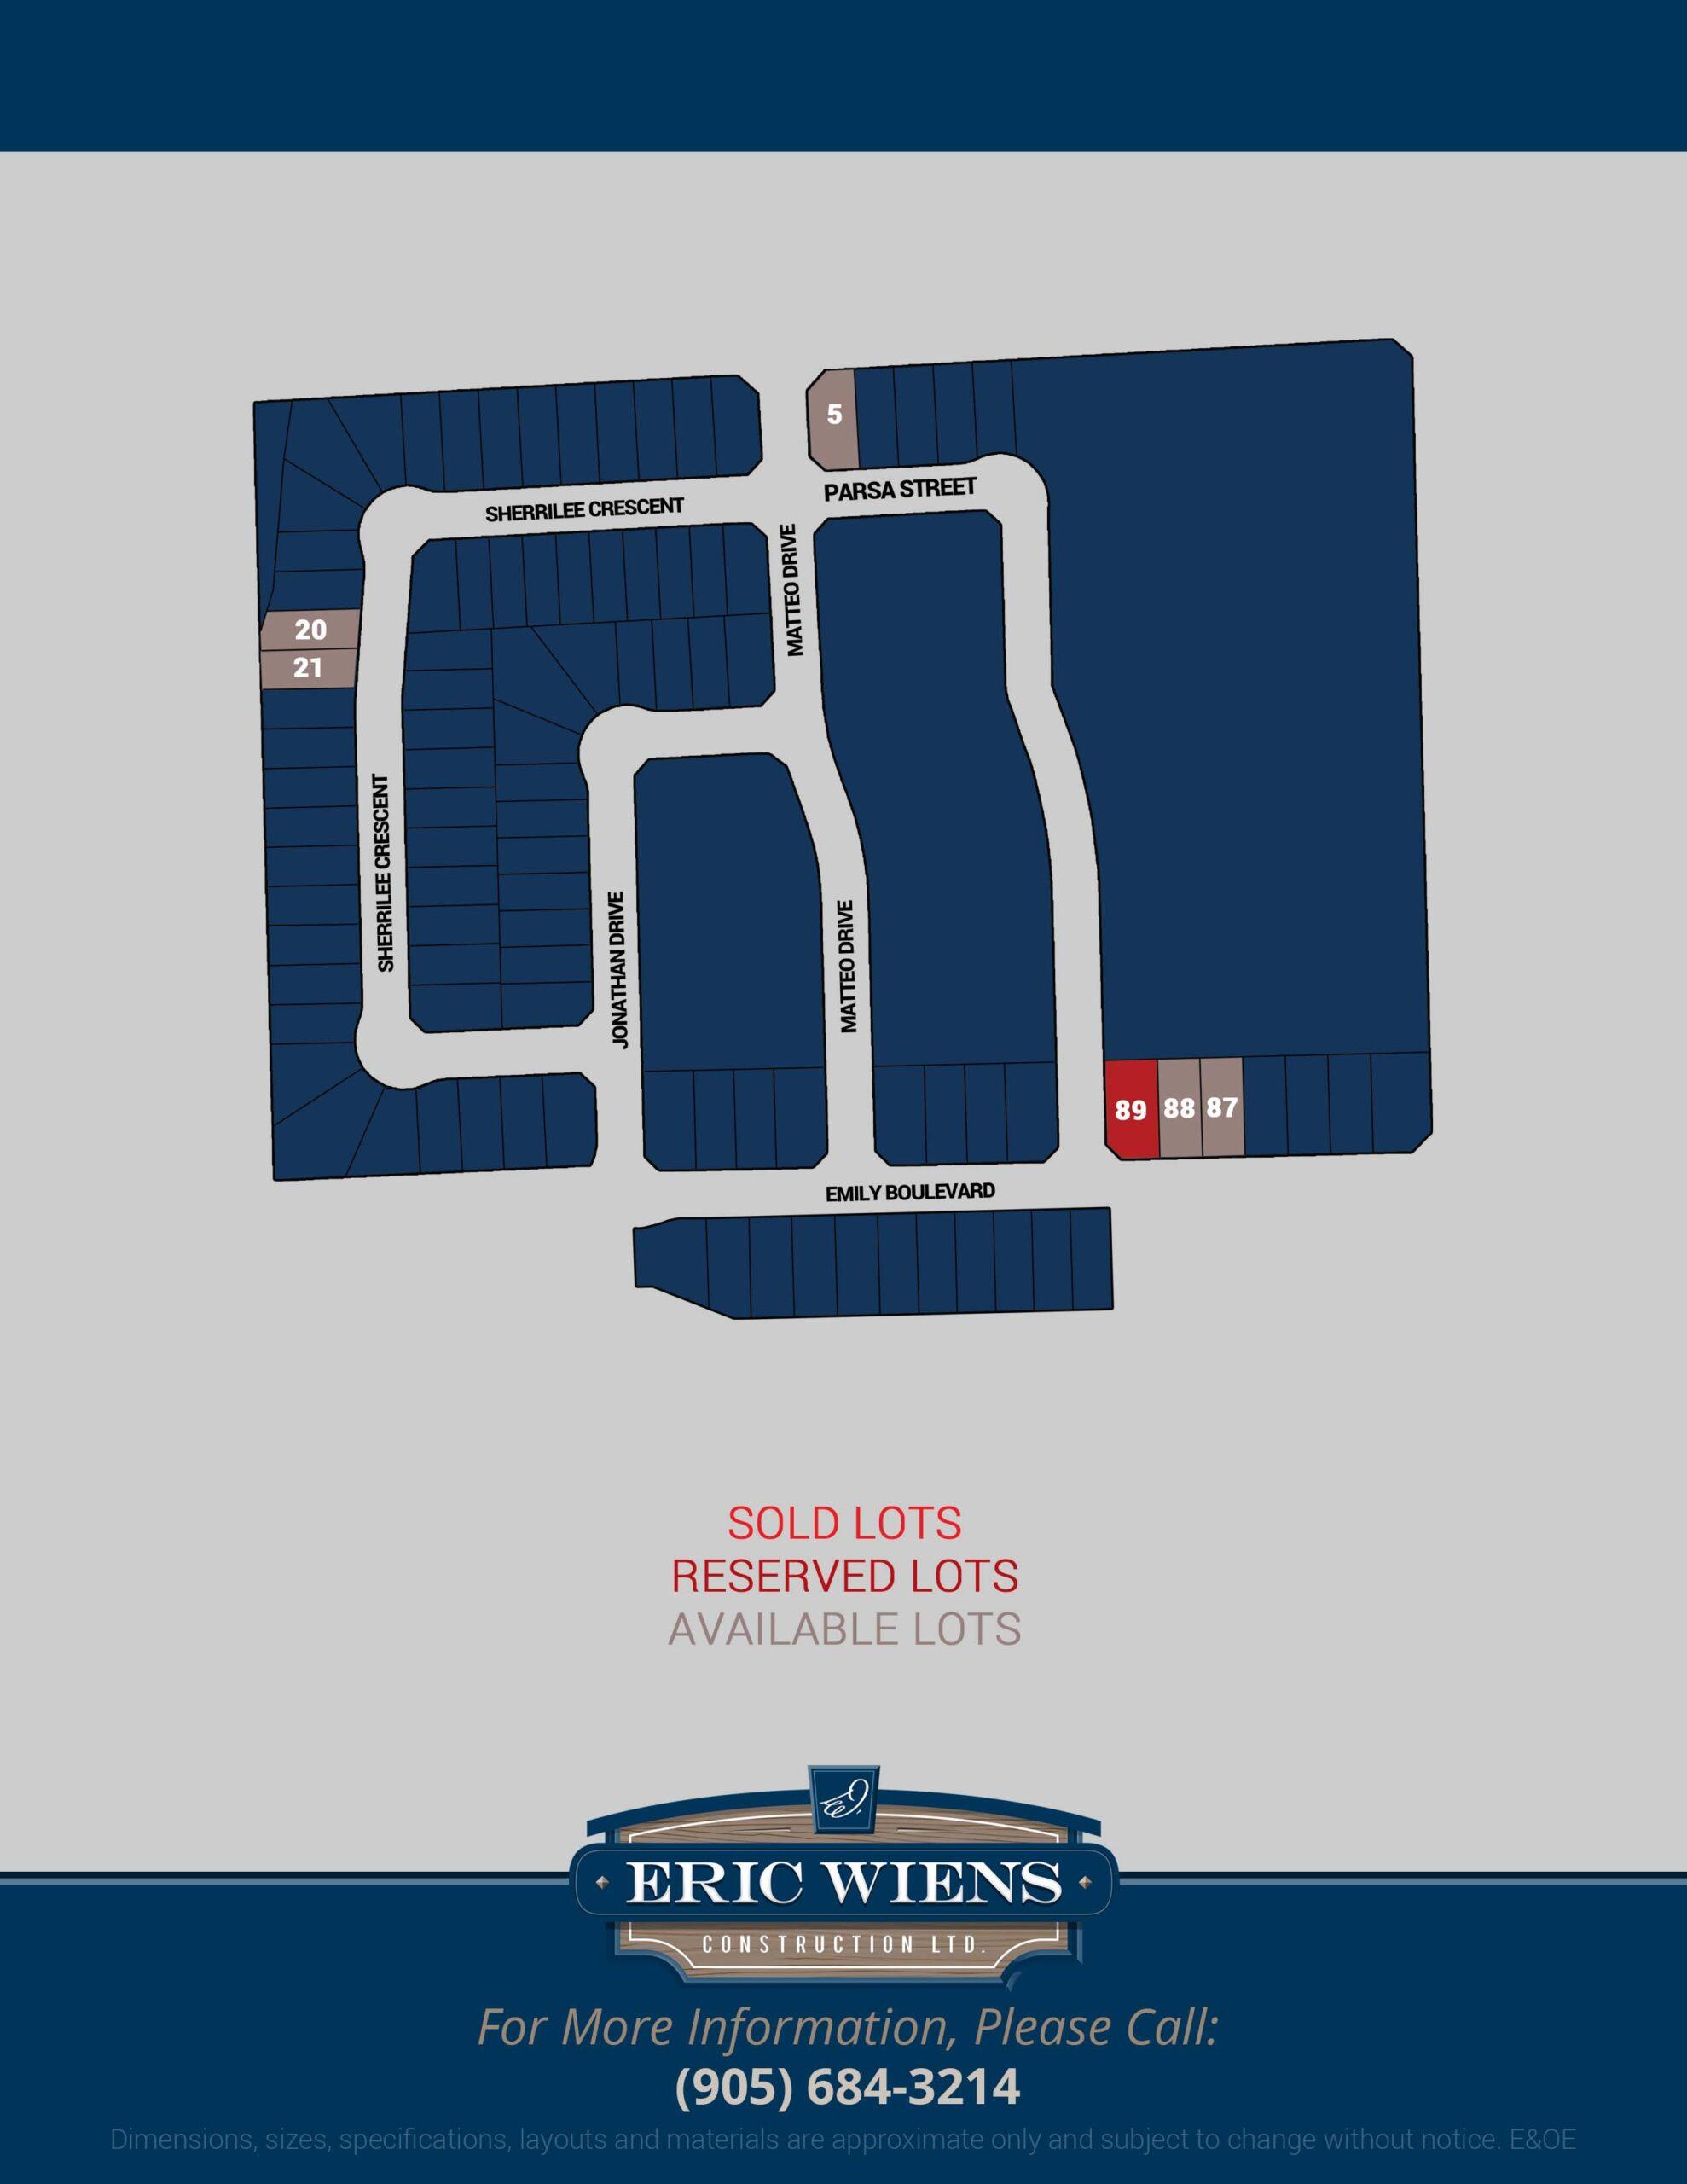 Lot 87 Emily Boulevard Site Plan